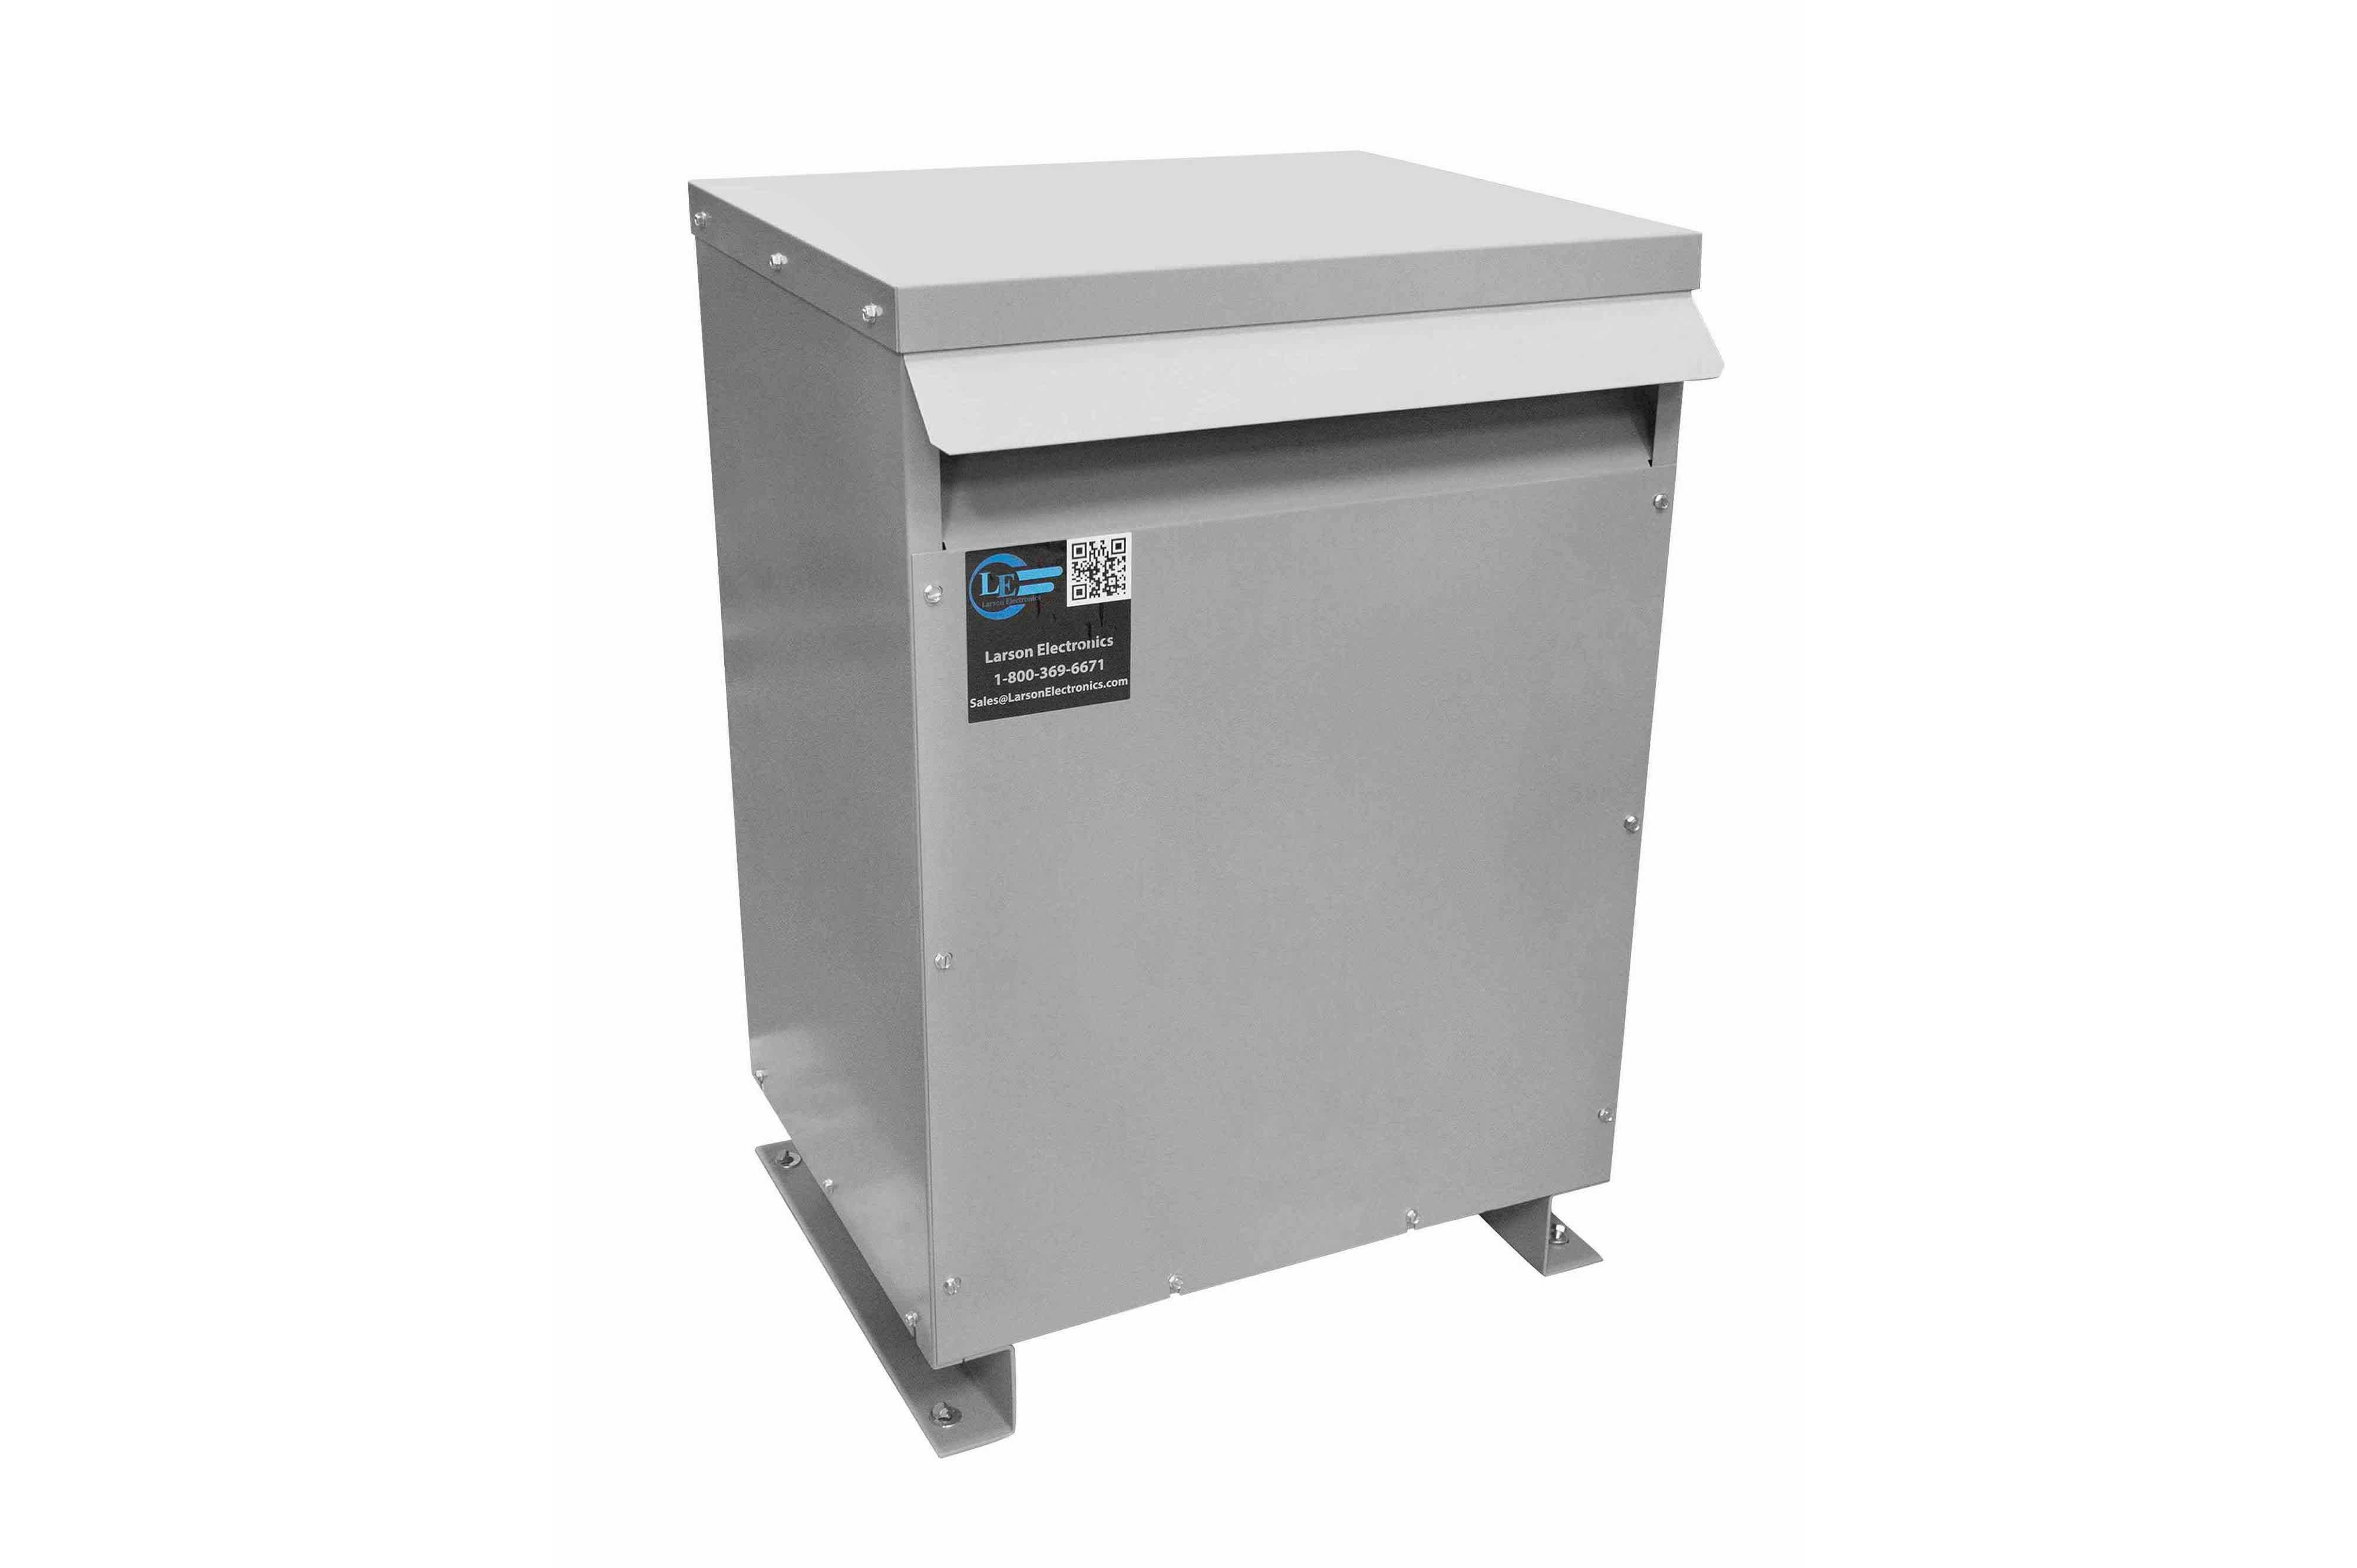 20 kVA 3PH Isolation Transformer, 480V Wye Primary, 600V Delta Secondary, N3R, Ventilated, 60 Hz